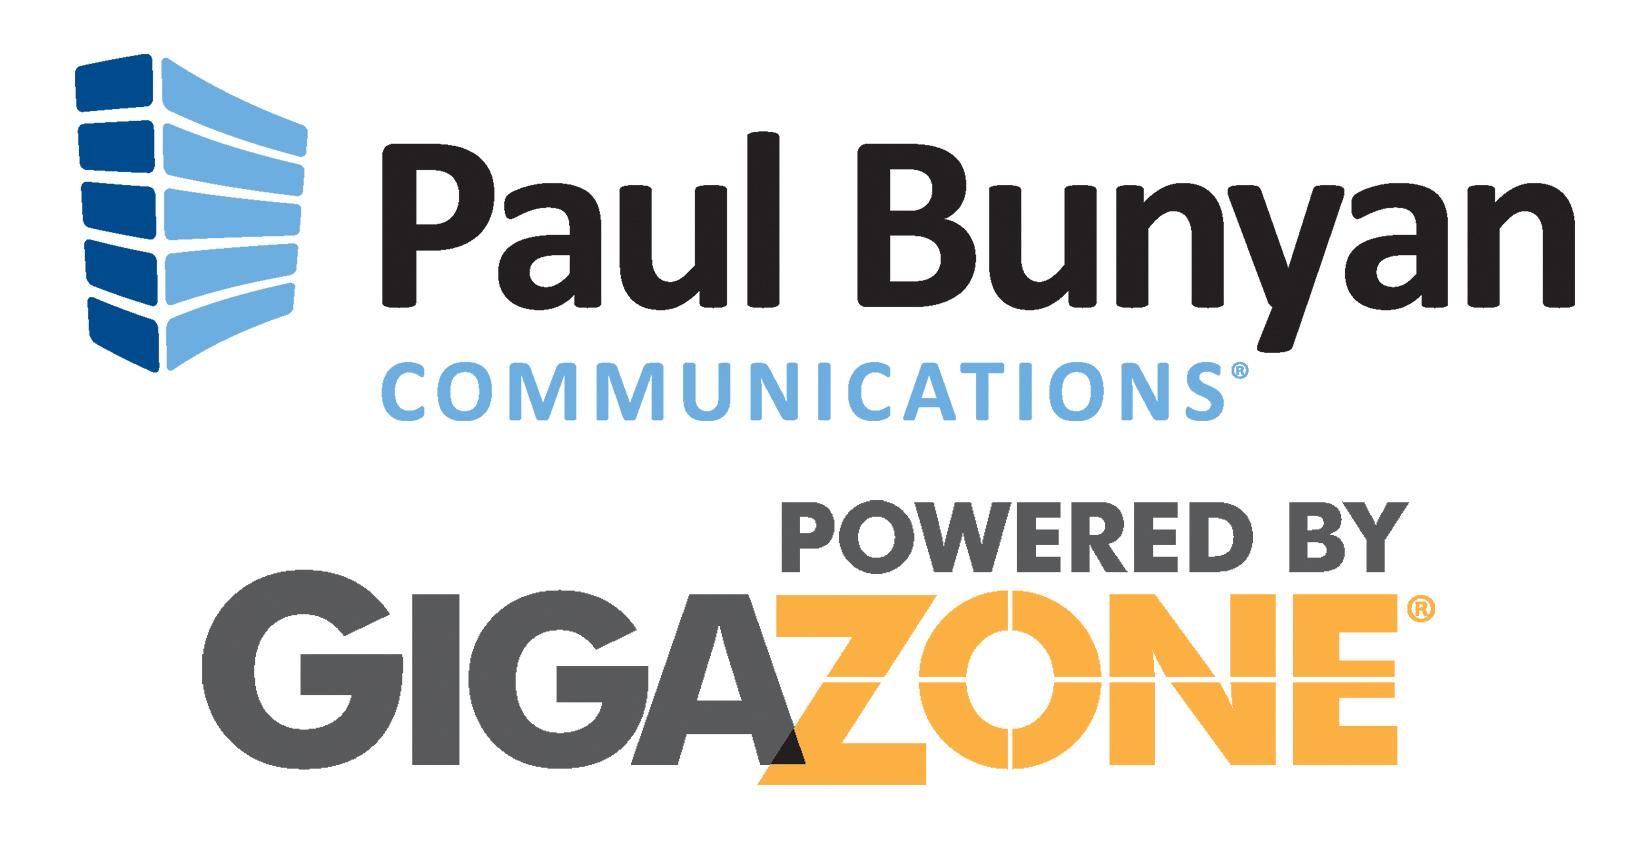 Paul Bunyan Communications powered by GigaZone